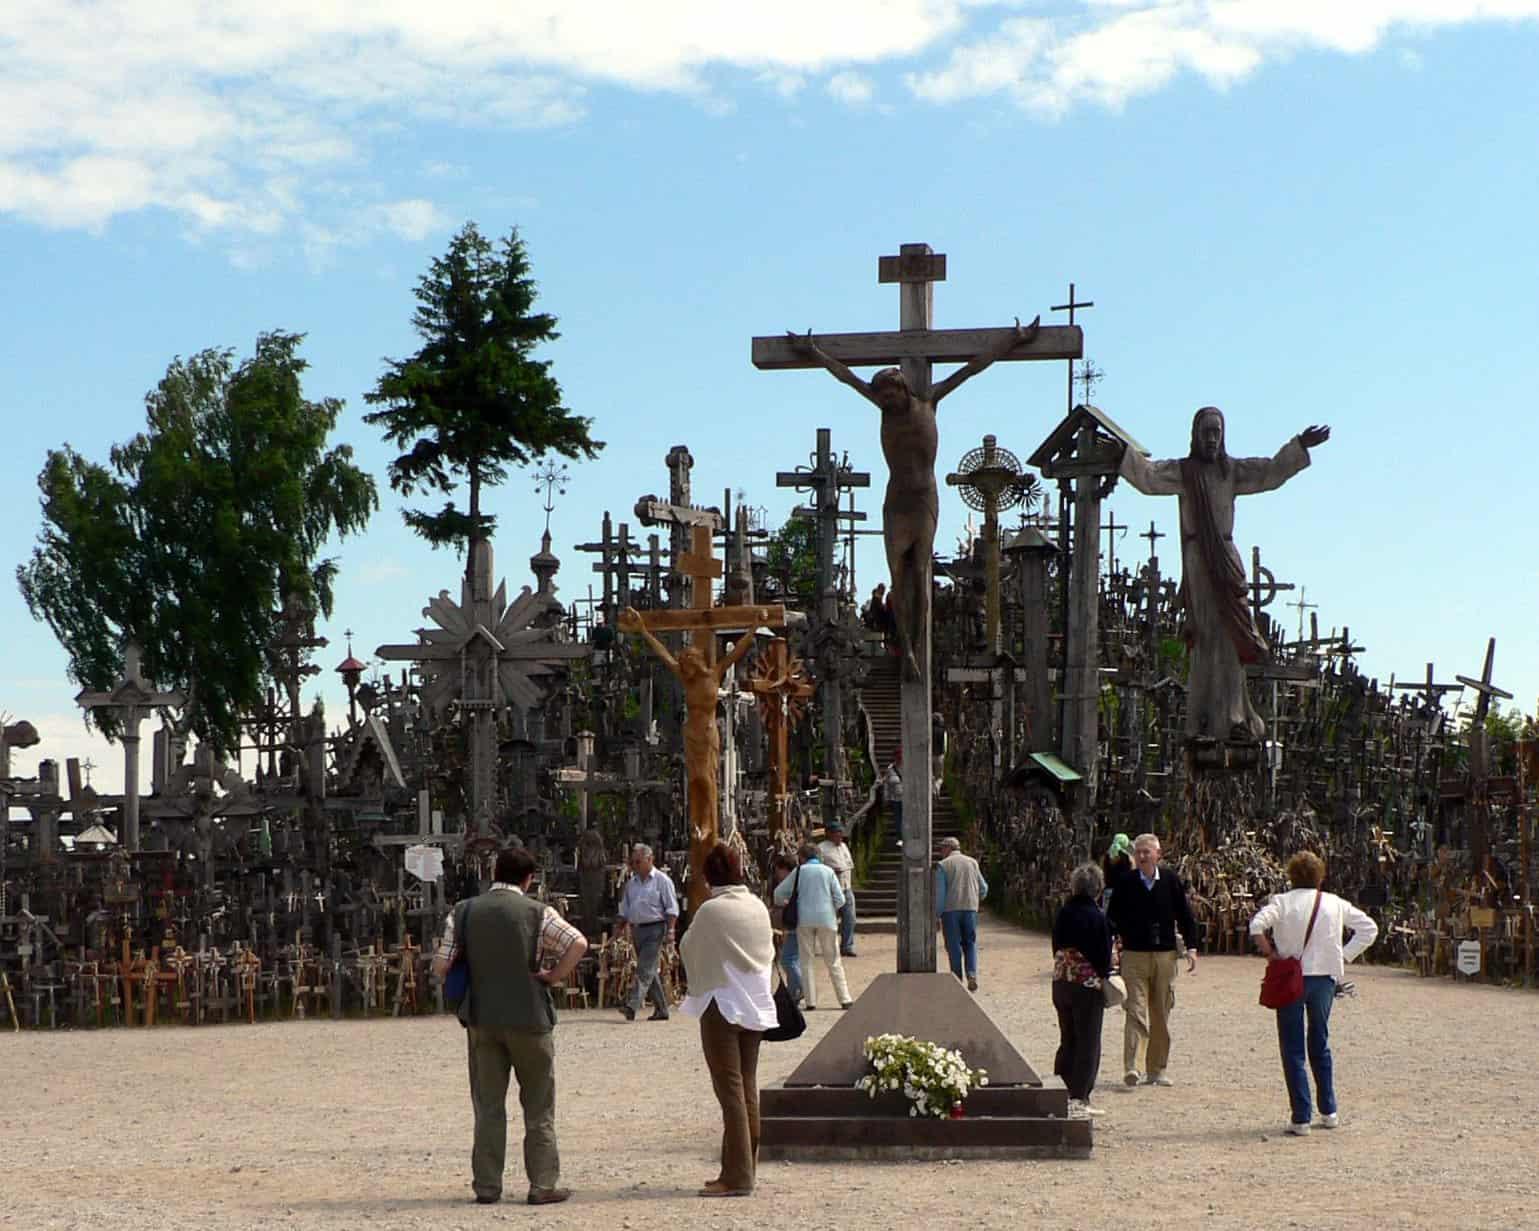 The cross donated by John Paul II